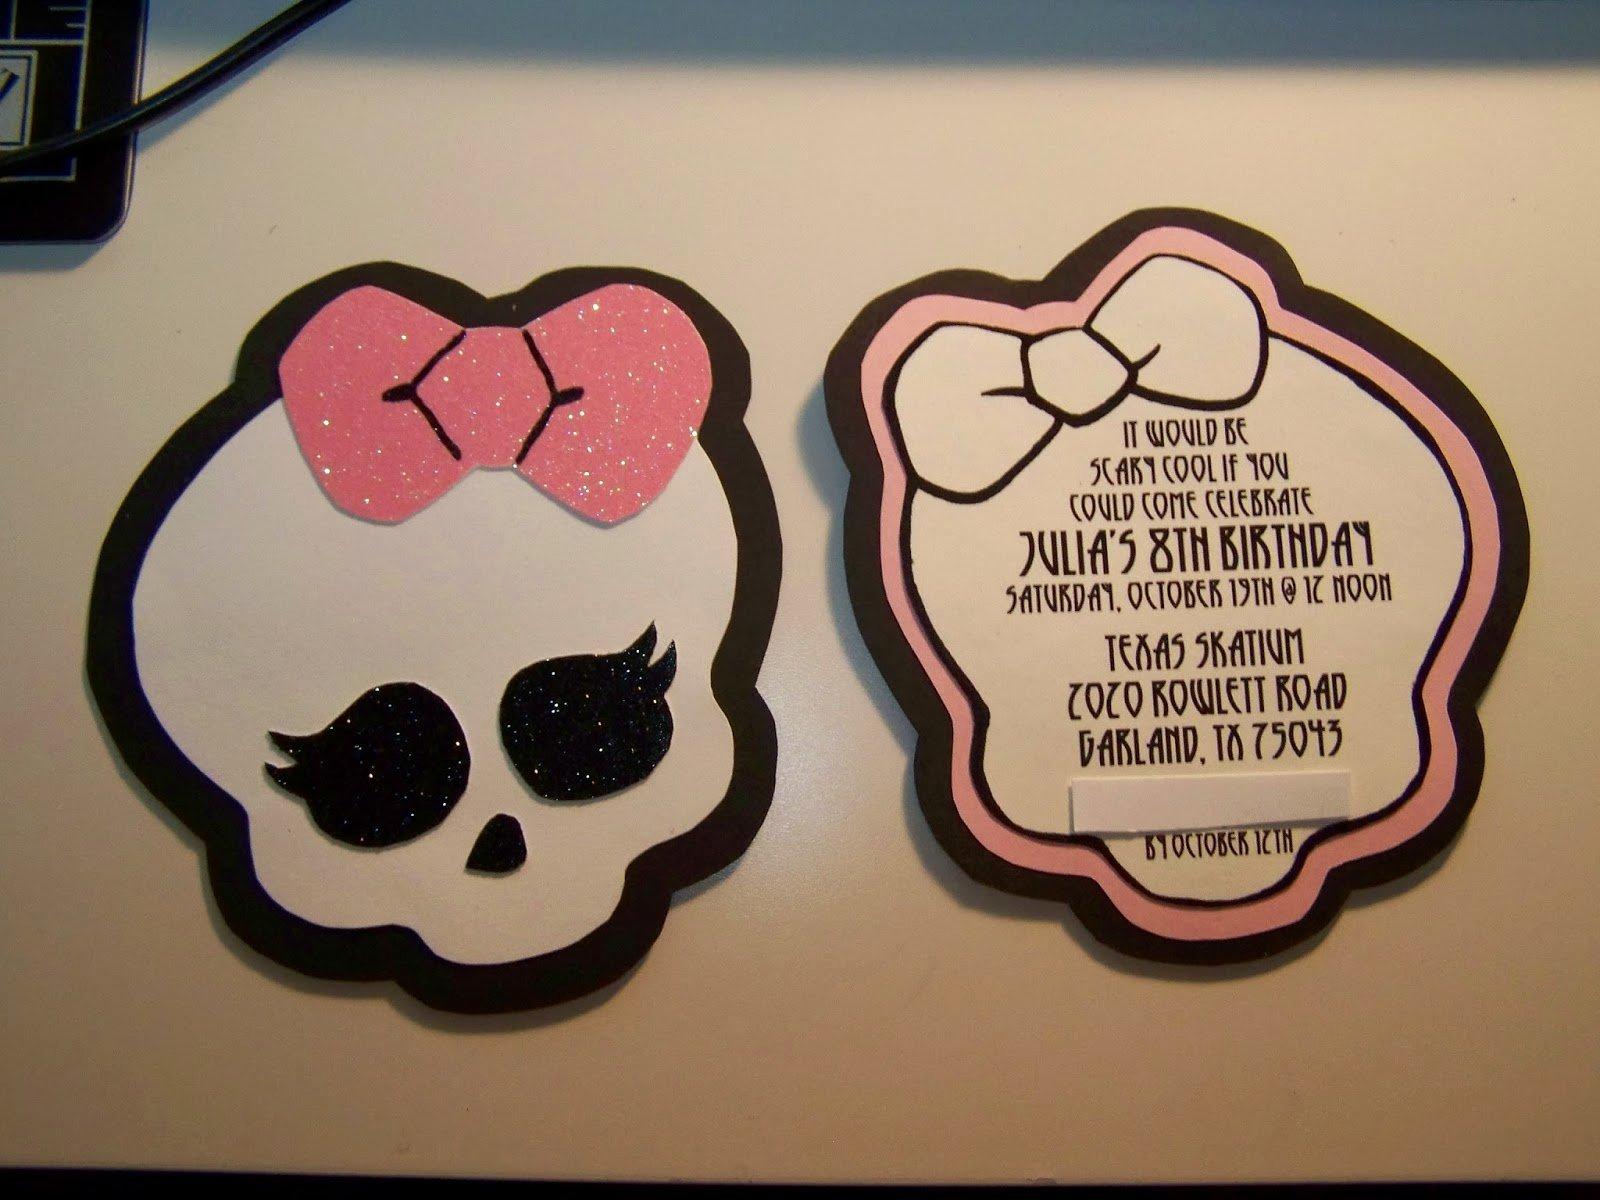 Monster High Invitations Templates Luxury Little Root Creations Handmade Monster High Invitations